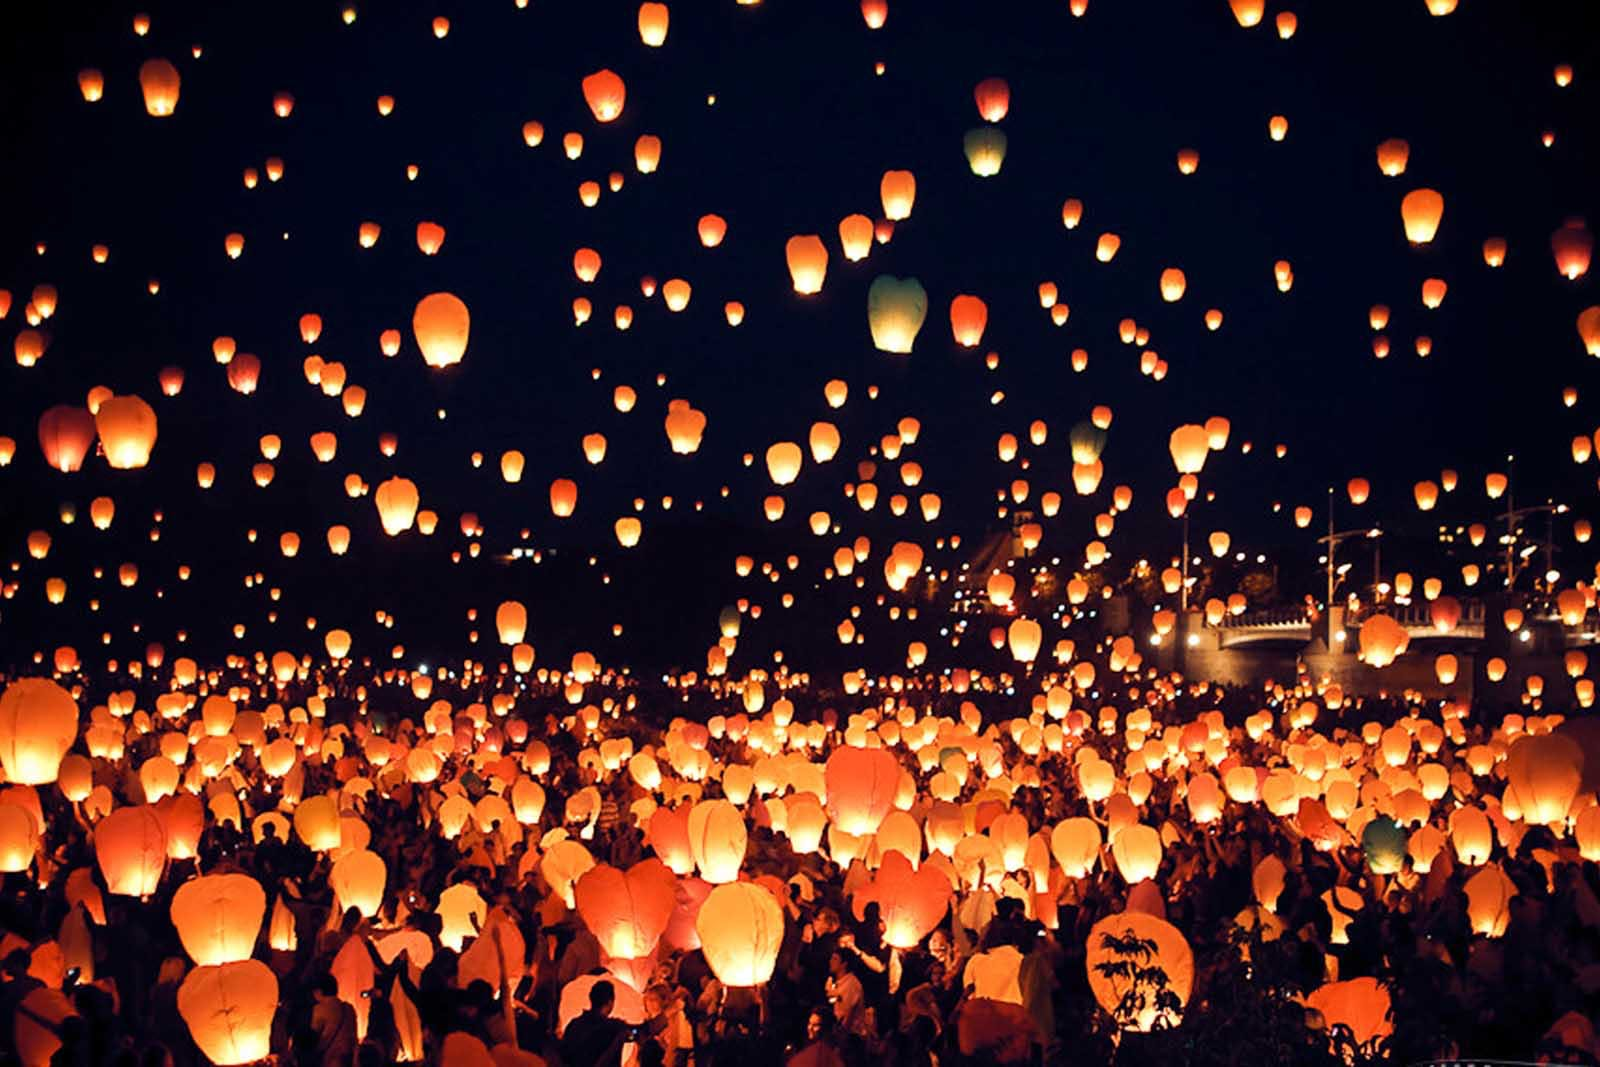 People lighting lanterns at night during Festival of São João.